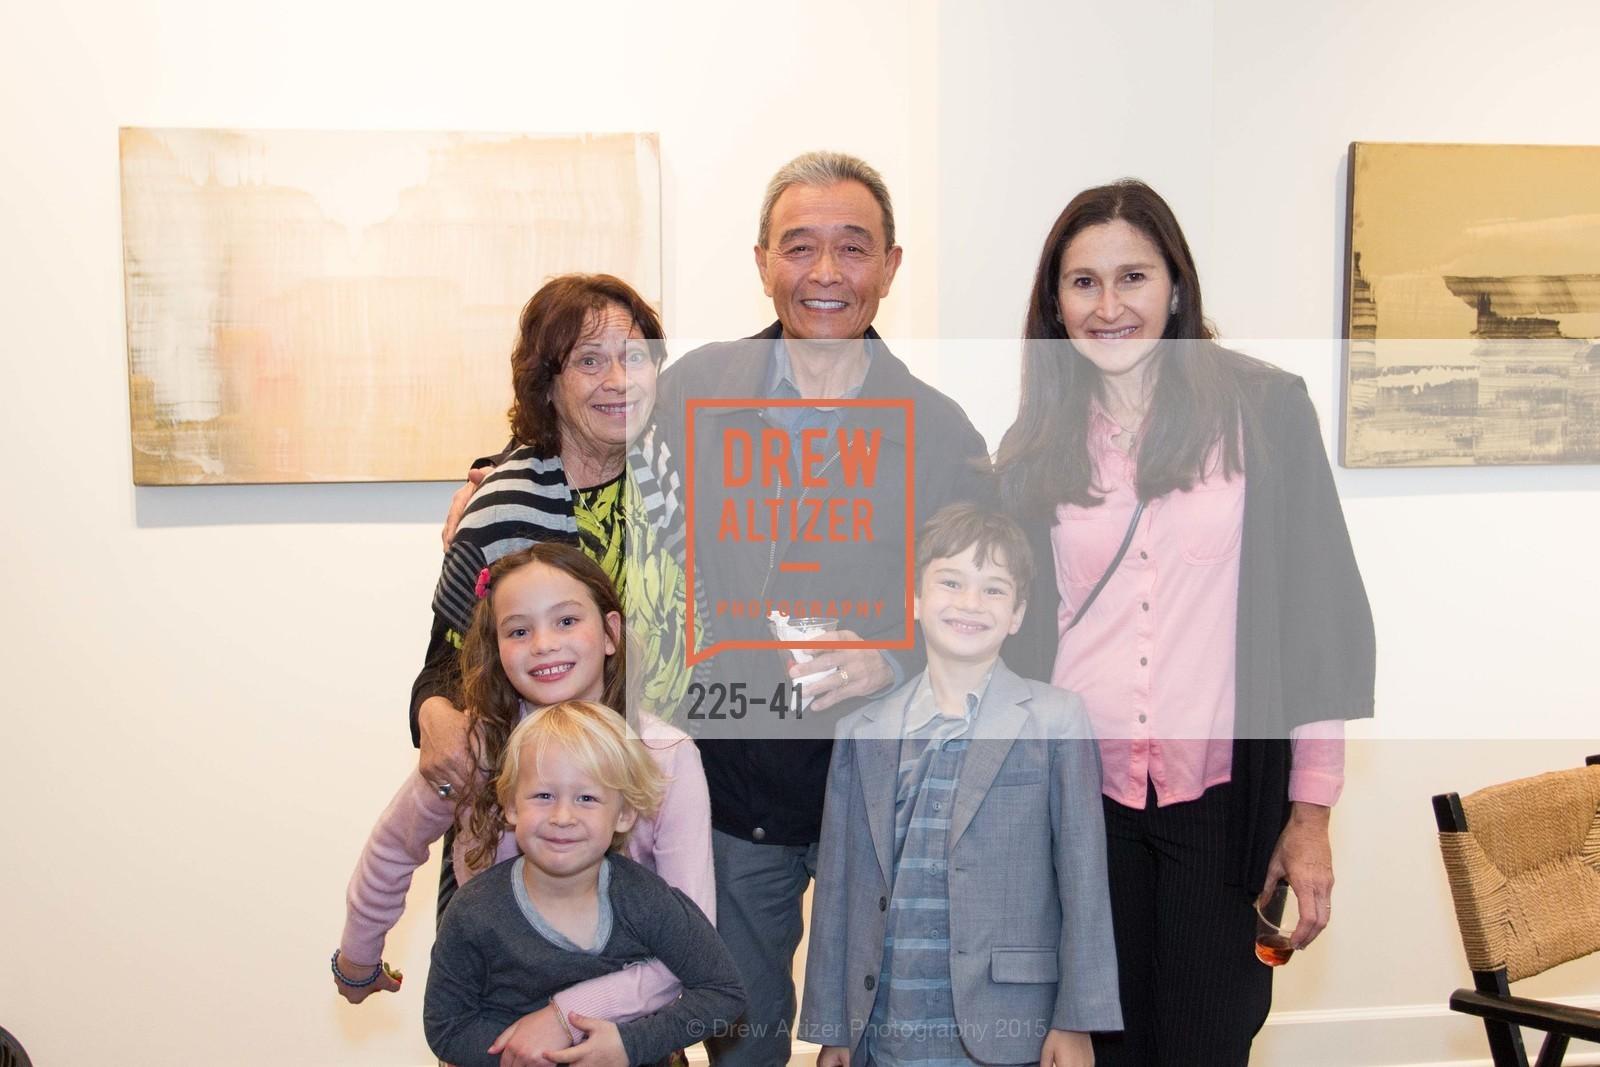 Hildie Spritzer, Tsutomu Satomi, Lia Mesnick, Projex Connect presents